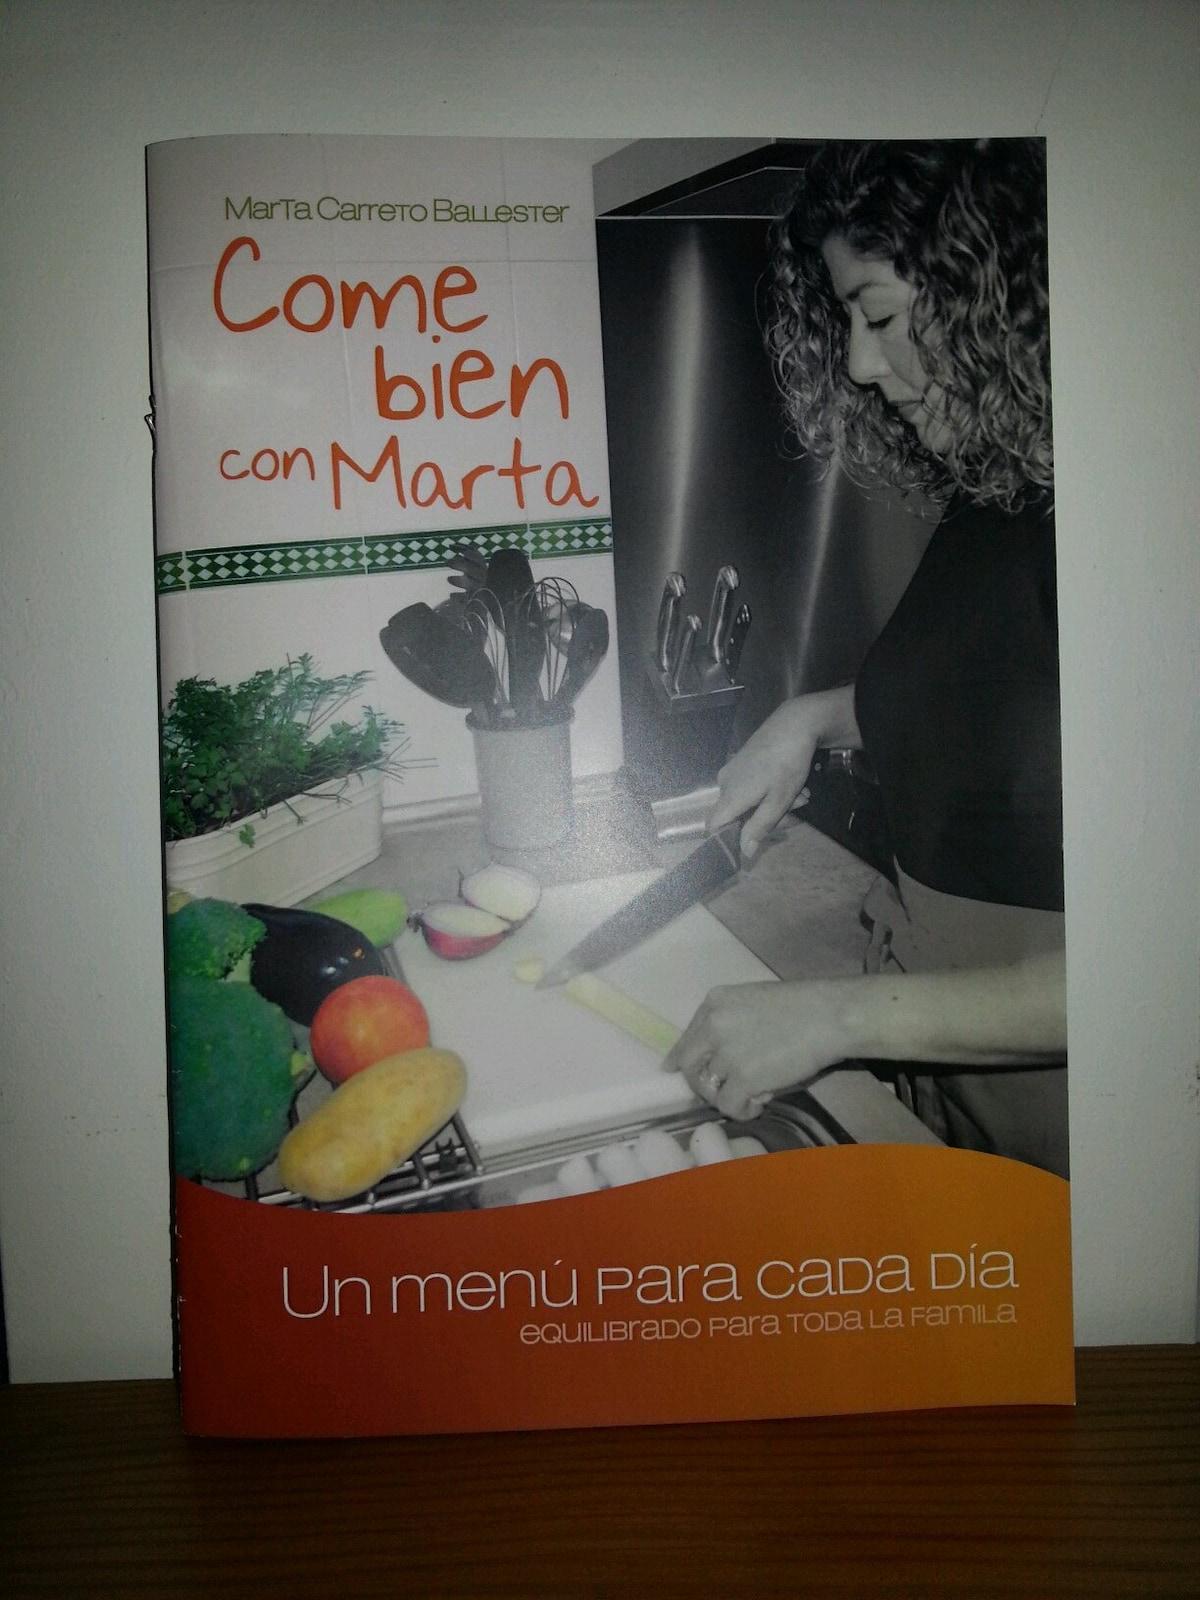 Marta From Seville, Spain